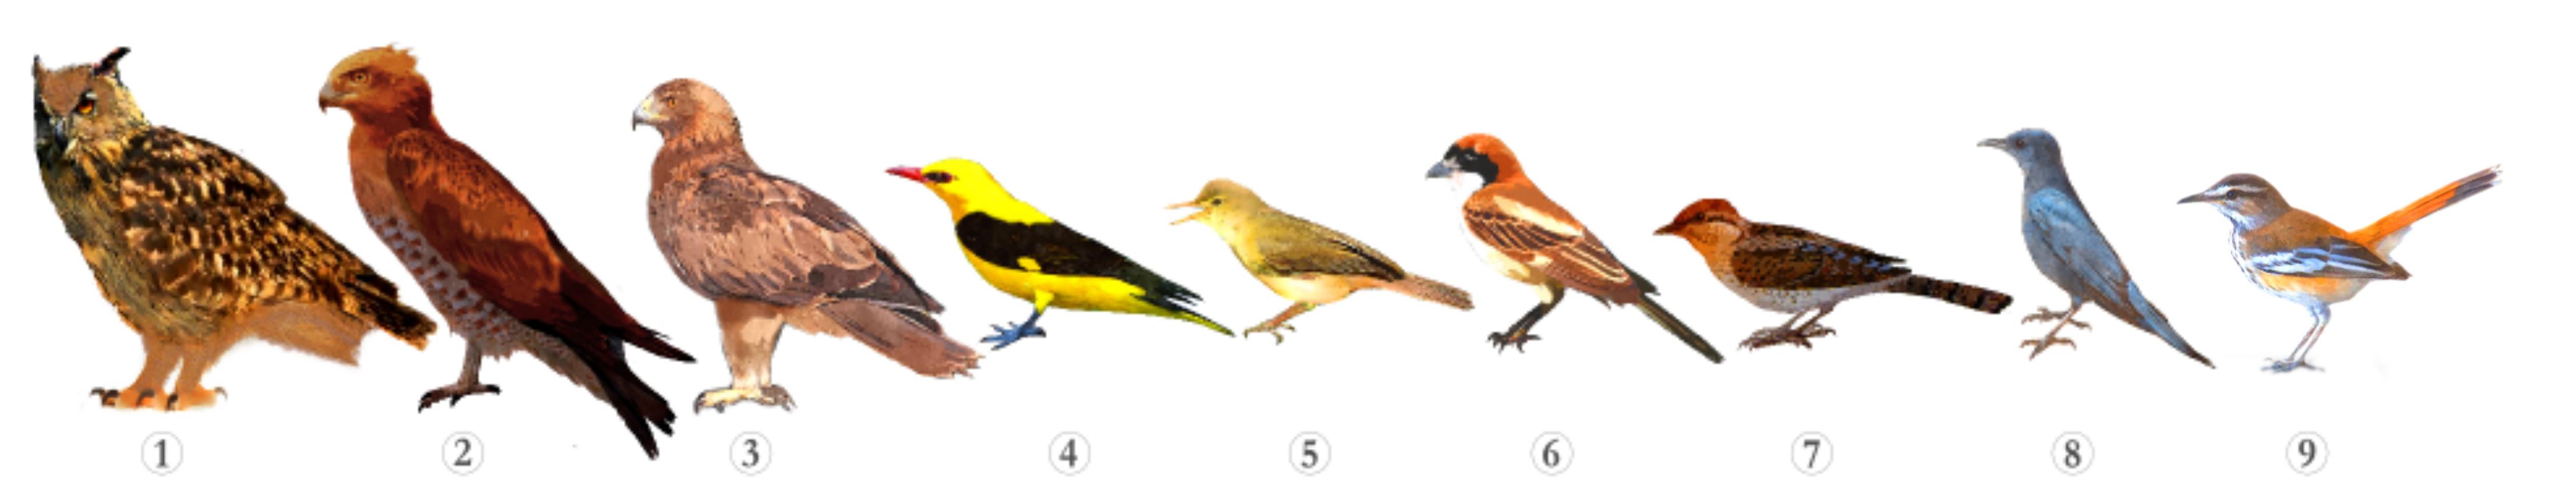 birds-of-the-algarve-barrocal-paderne